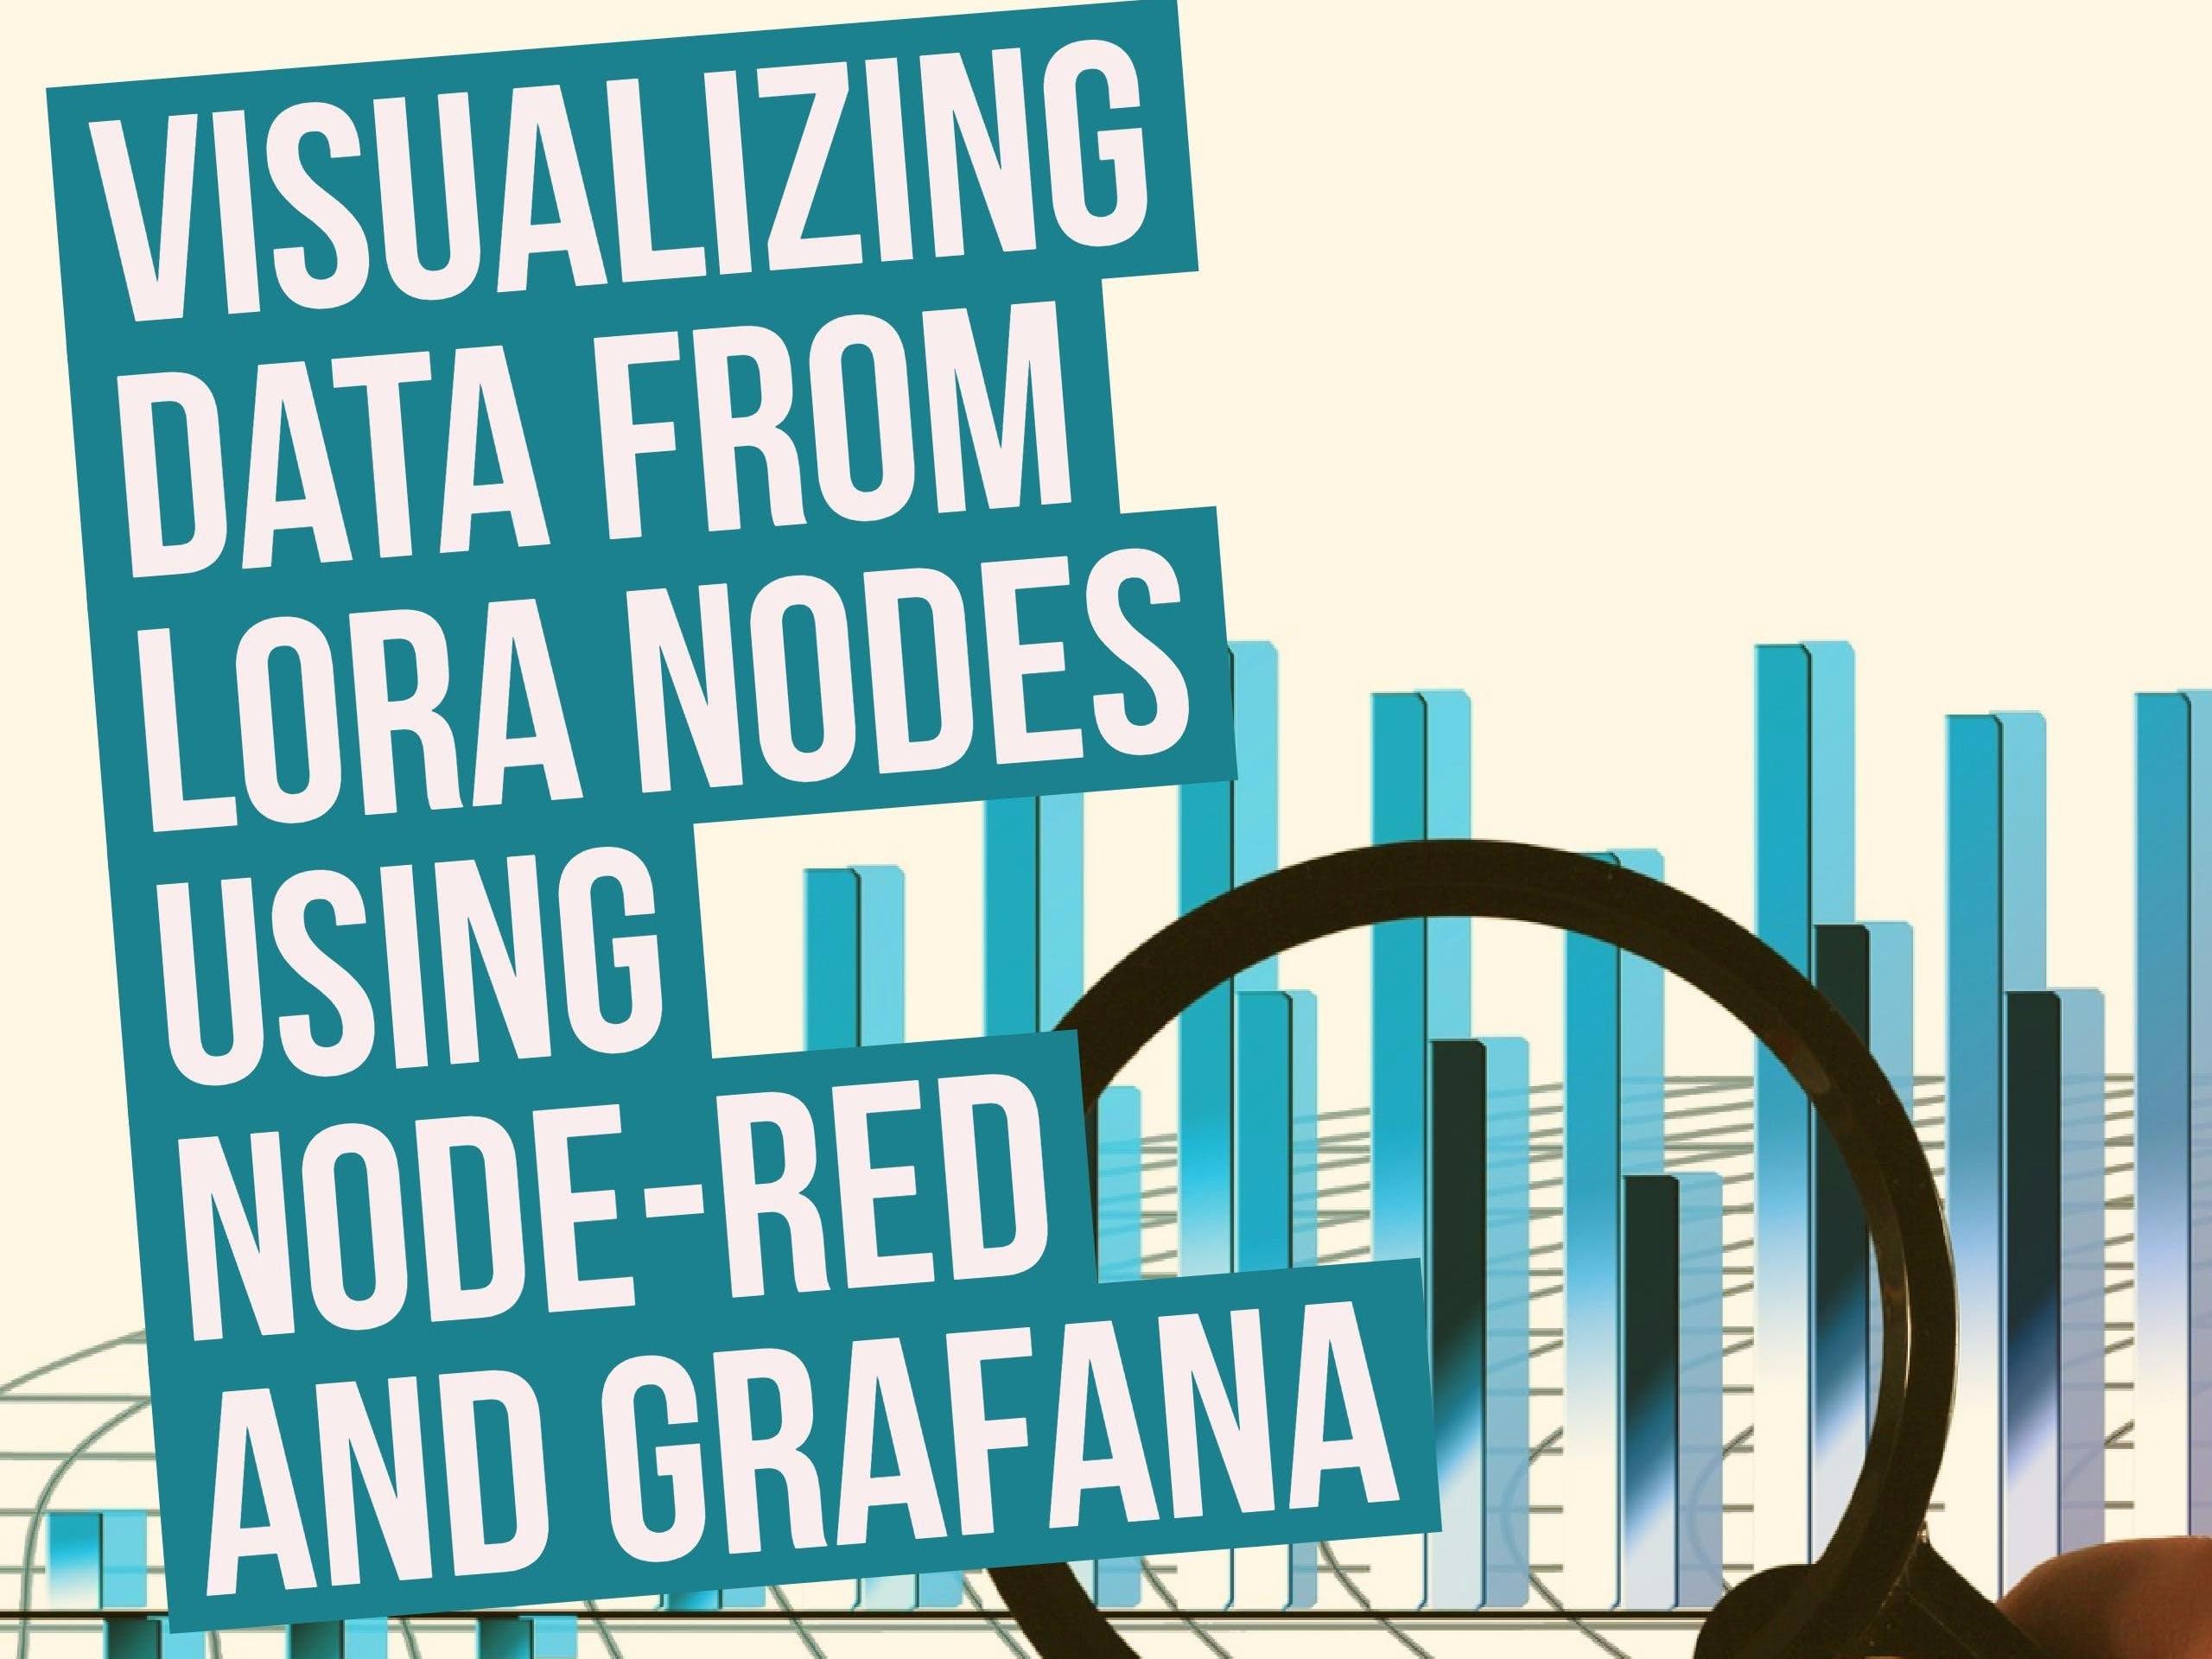 Visualizing Lora Node data with Node-red and Grafana